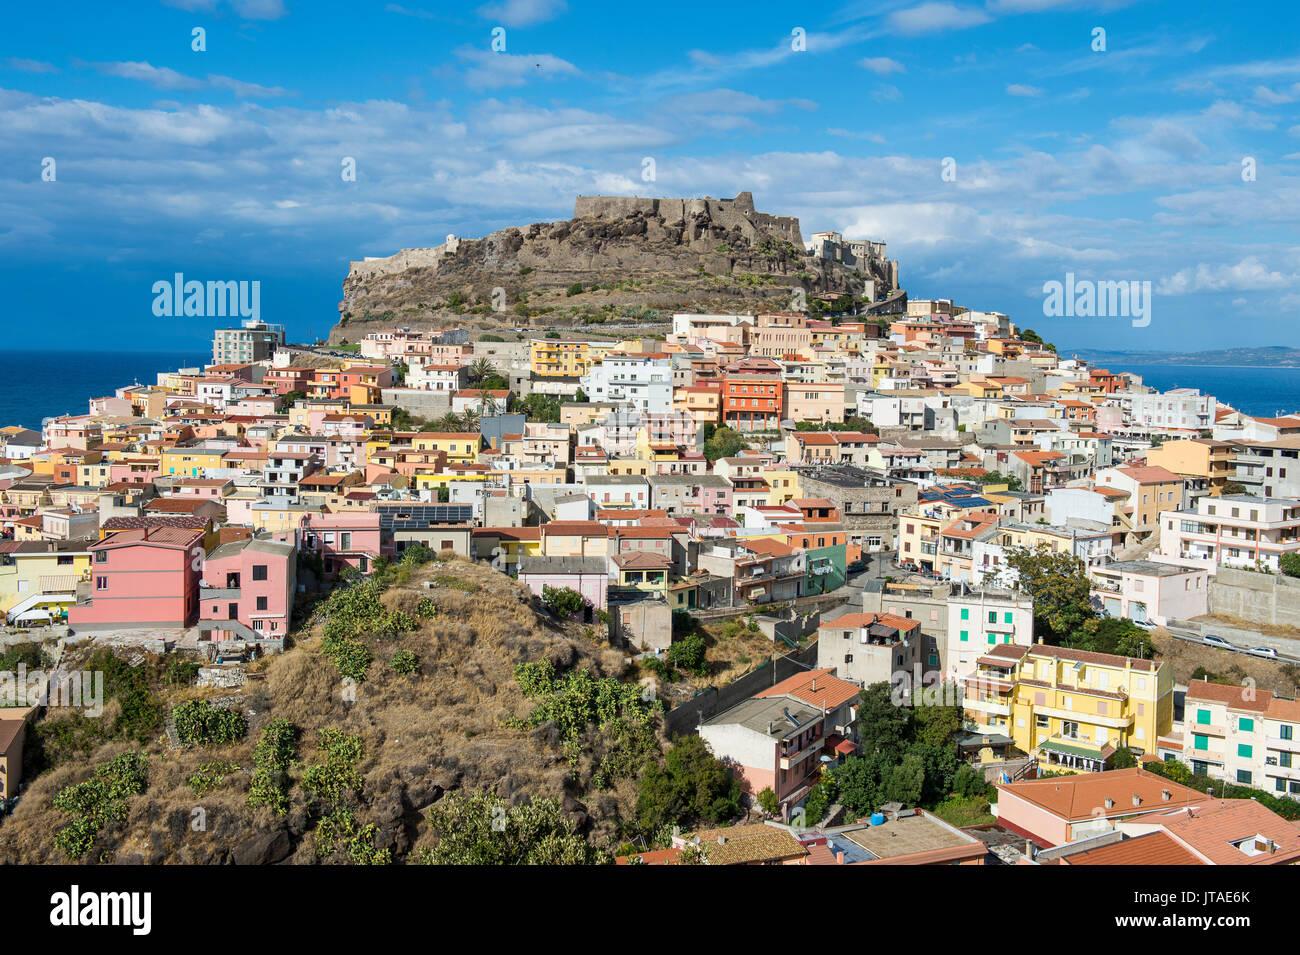 Vista su Castelsardo, Sardegna, Italia, Mediterraneo, Europa Foto Stock